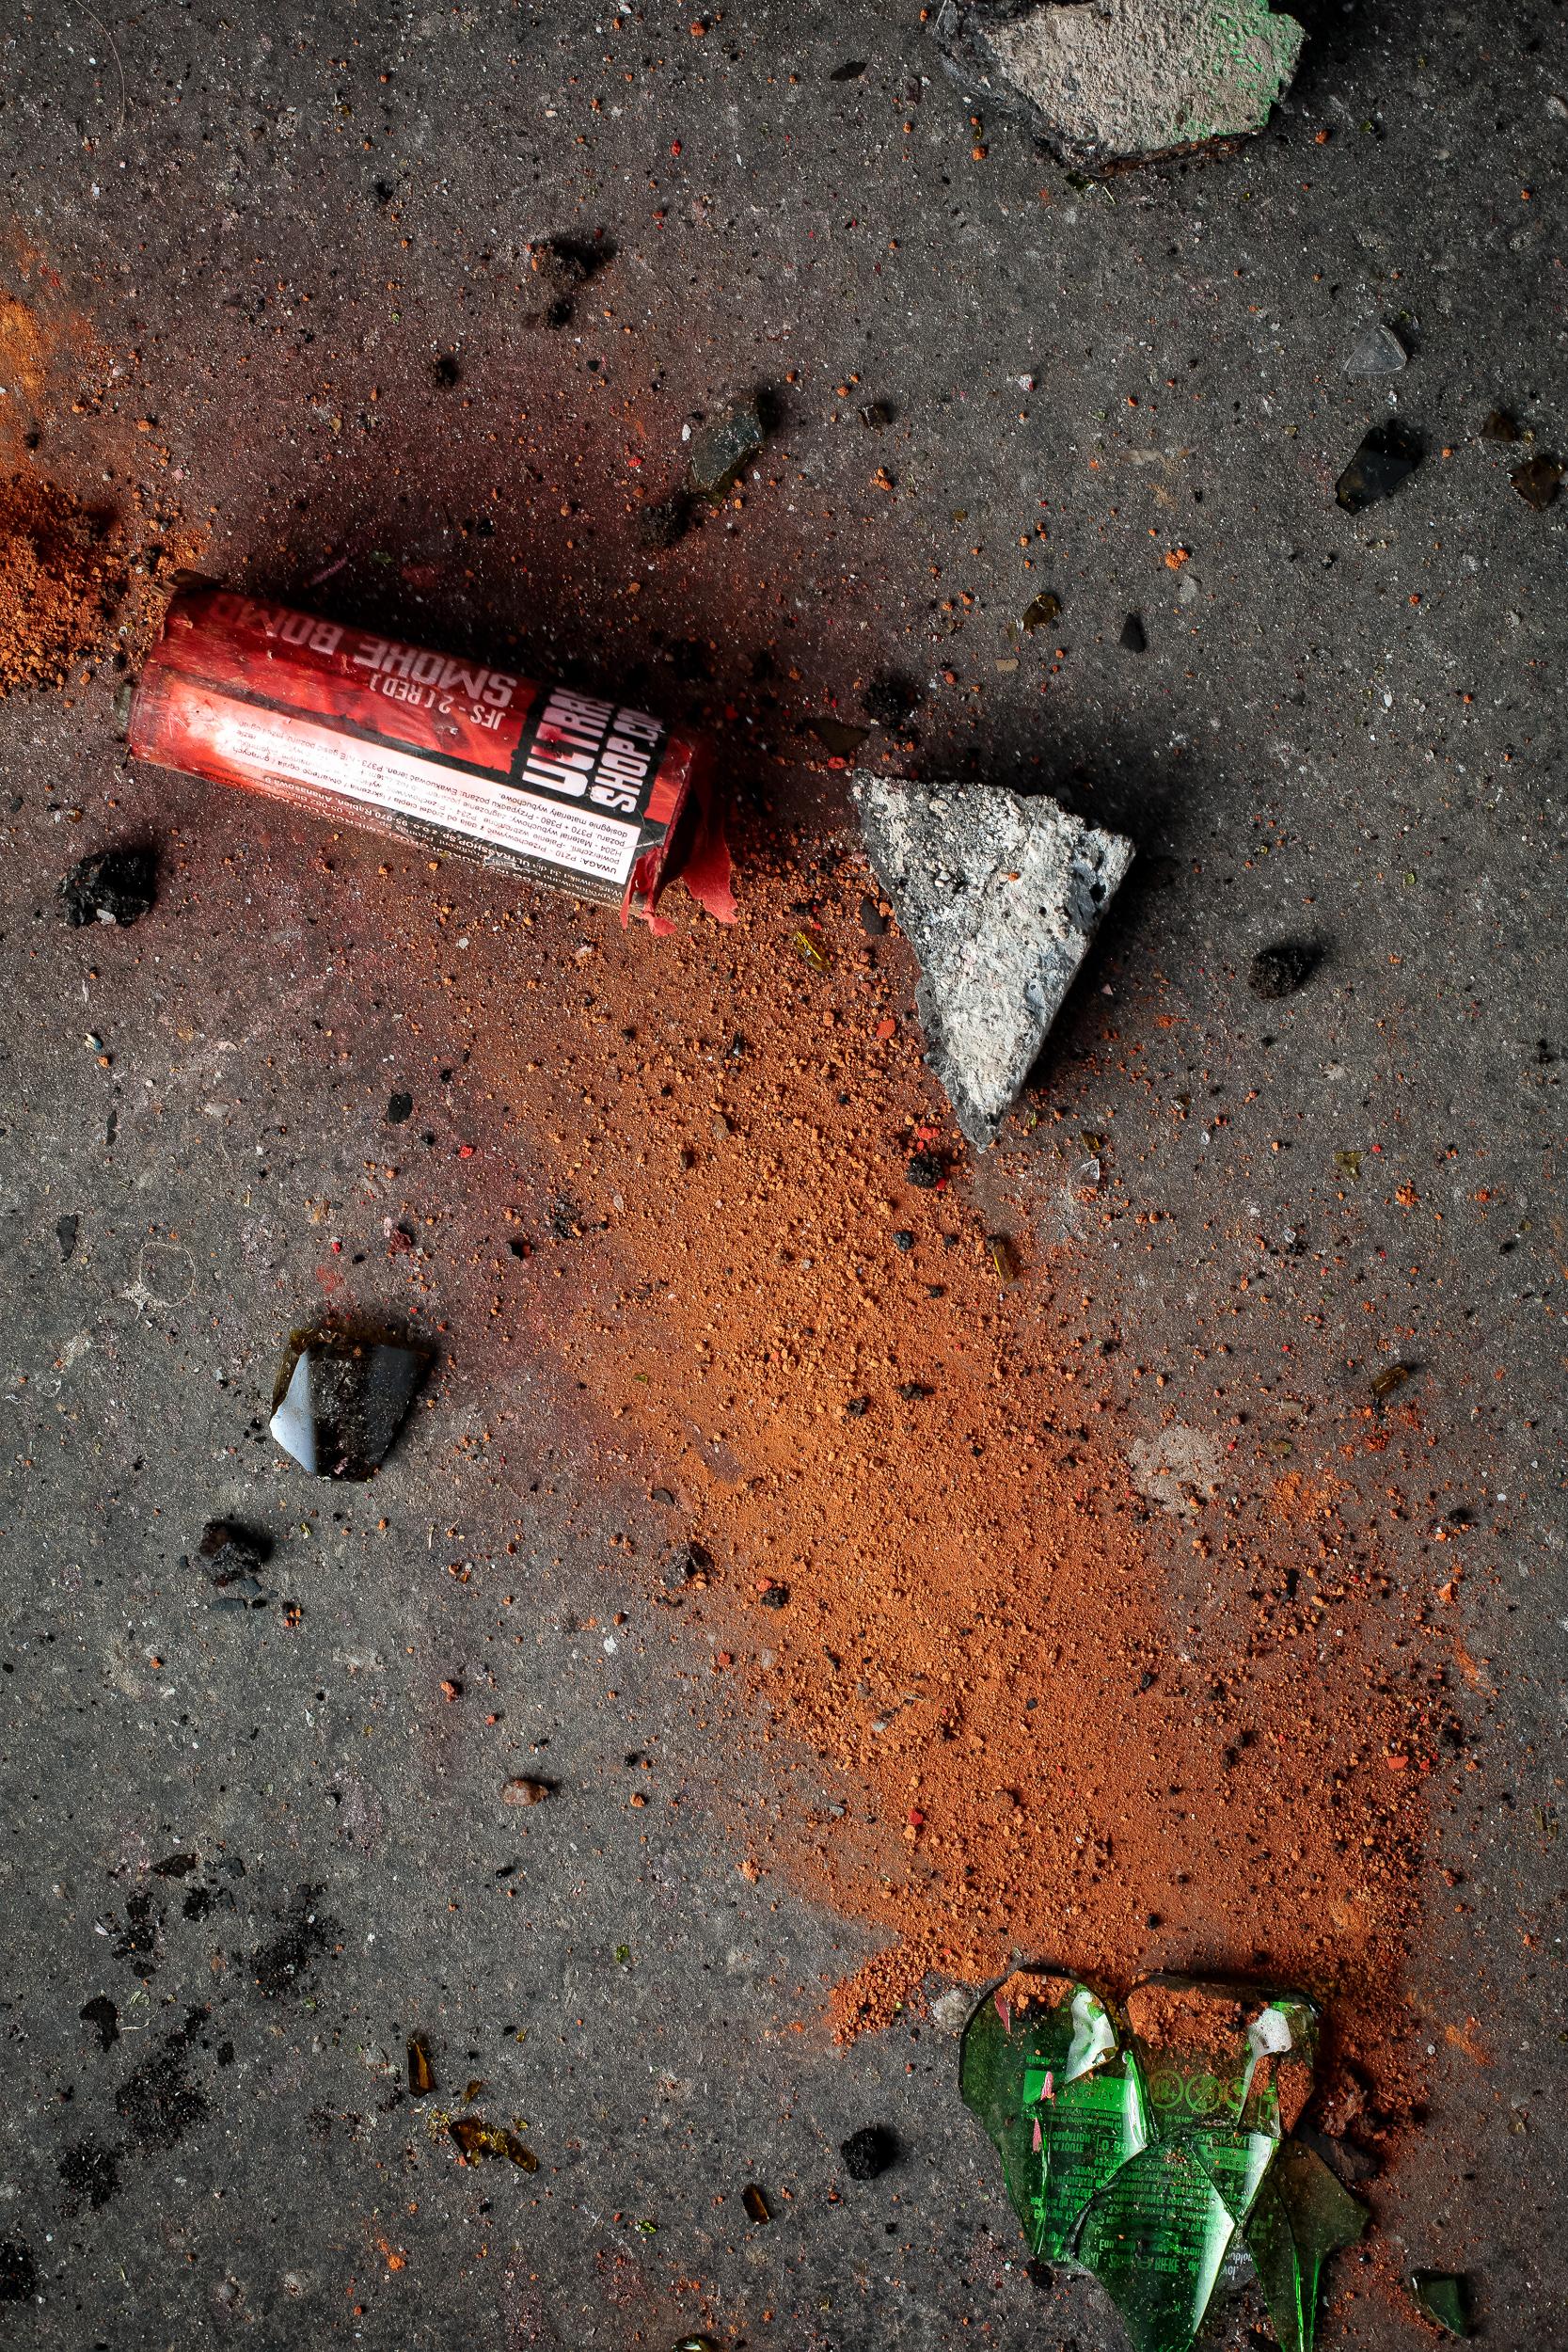 Cement blocks, red smoke bomb and broken bottles, 2018